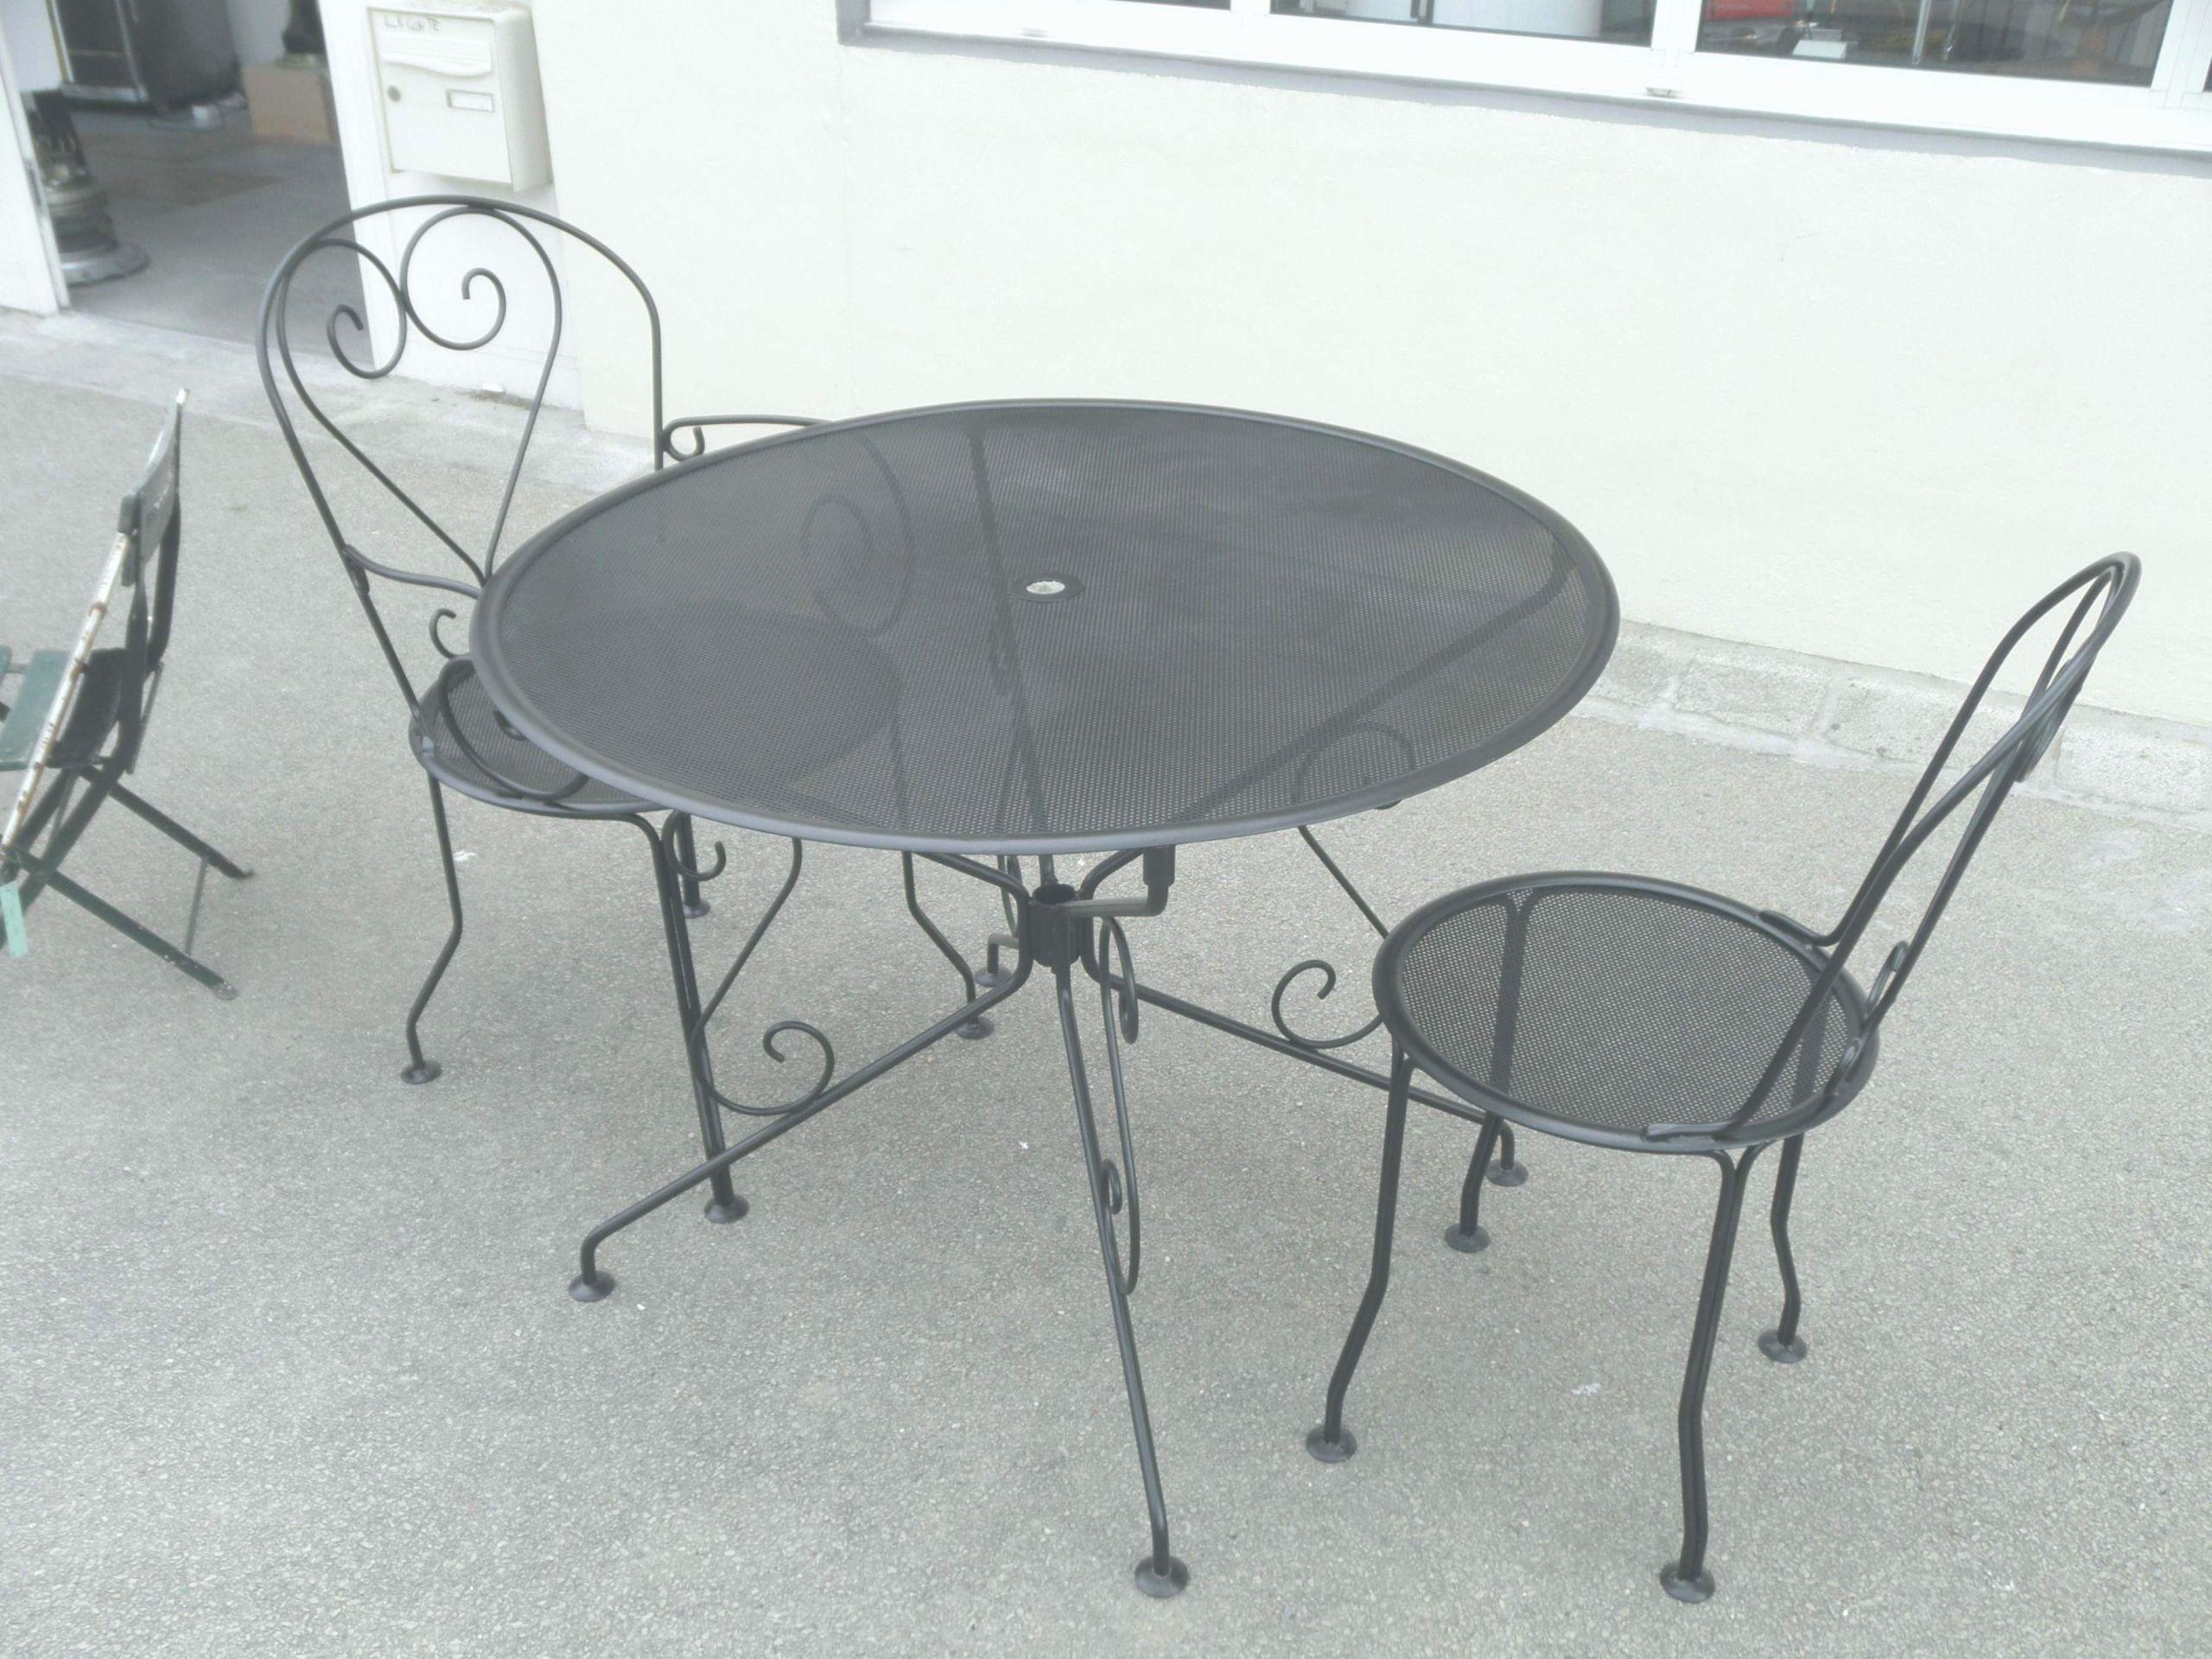 table jardin retractable luxe table de jardin et chaises luxury chaise hesperide beau table jardin of table jardin retractable